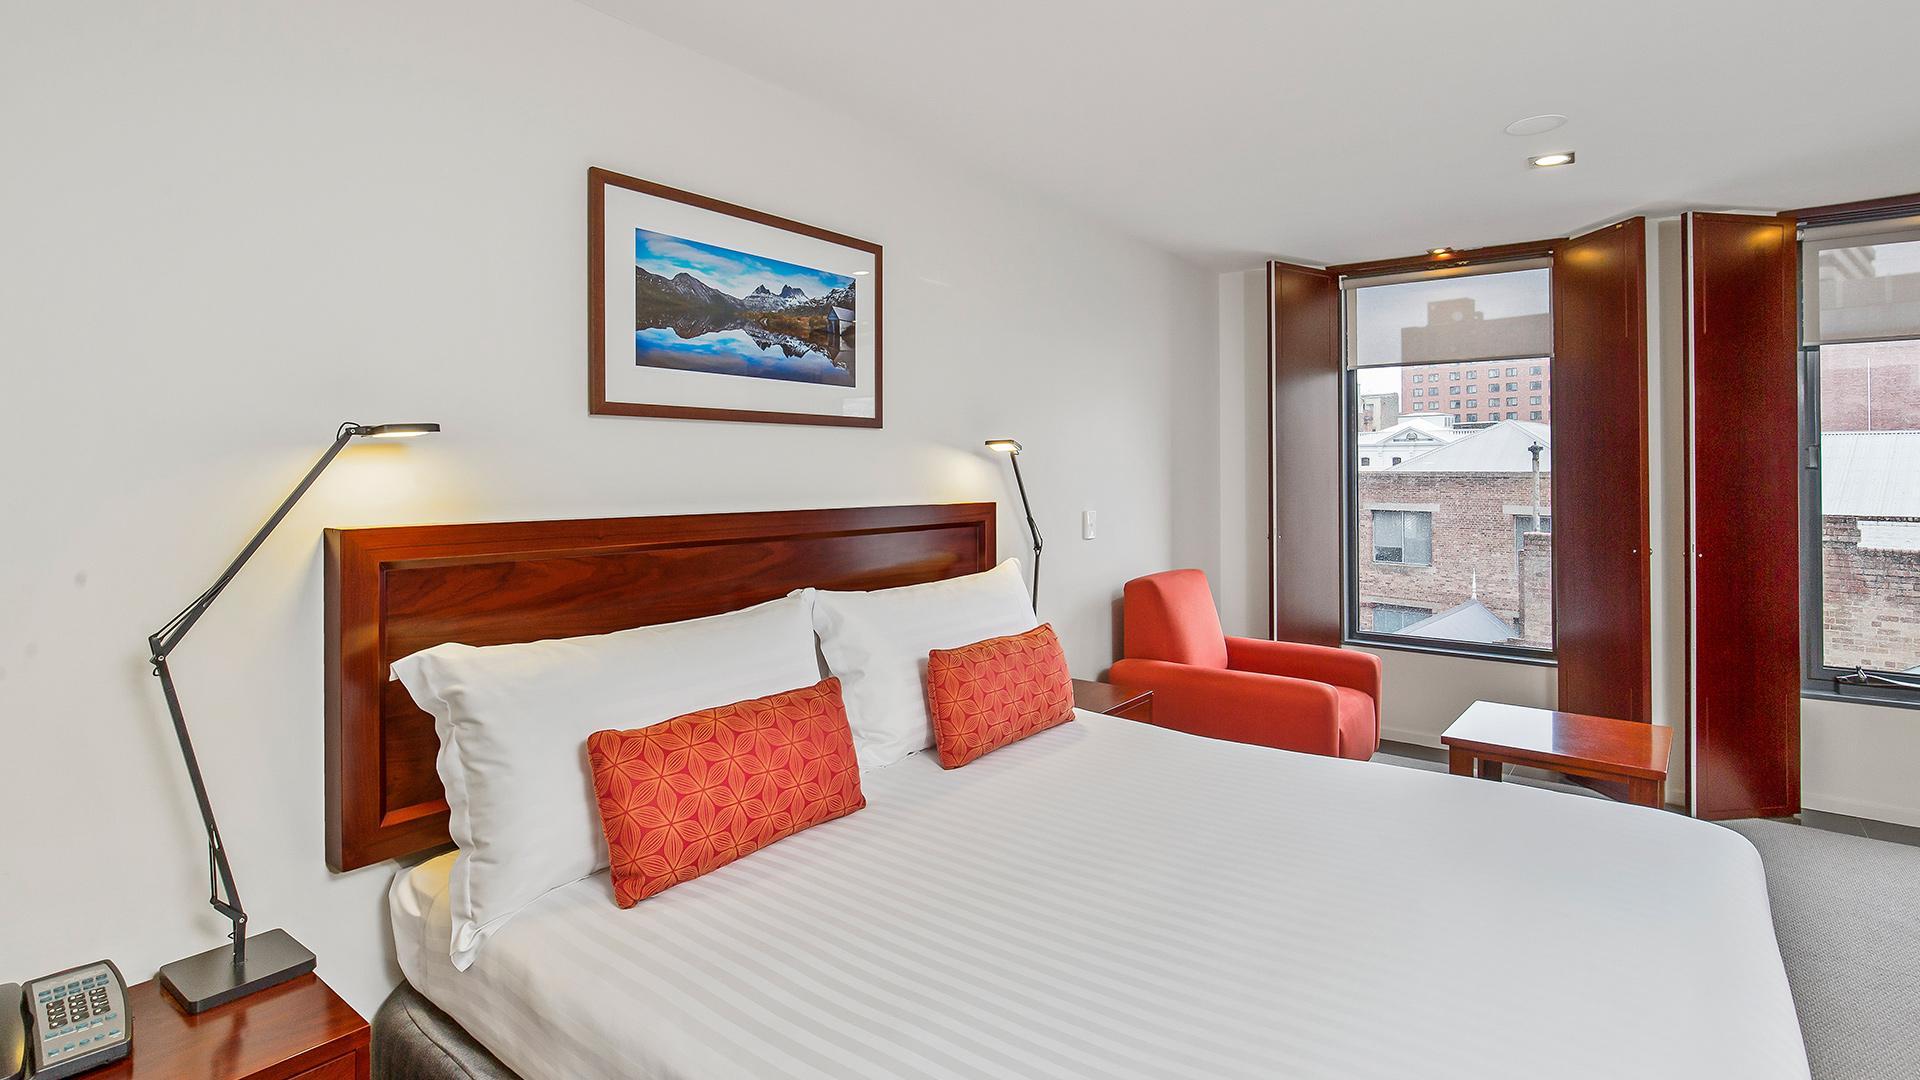 Hotel King Room  image 1 at RACV Hobart Hotel by Hobart City Council, Tasmania, Australia